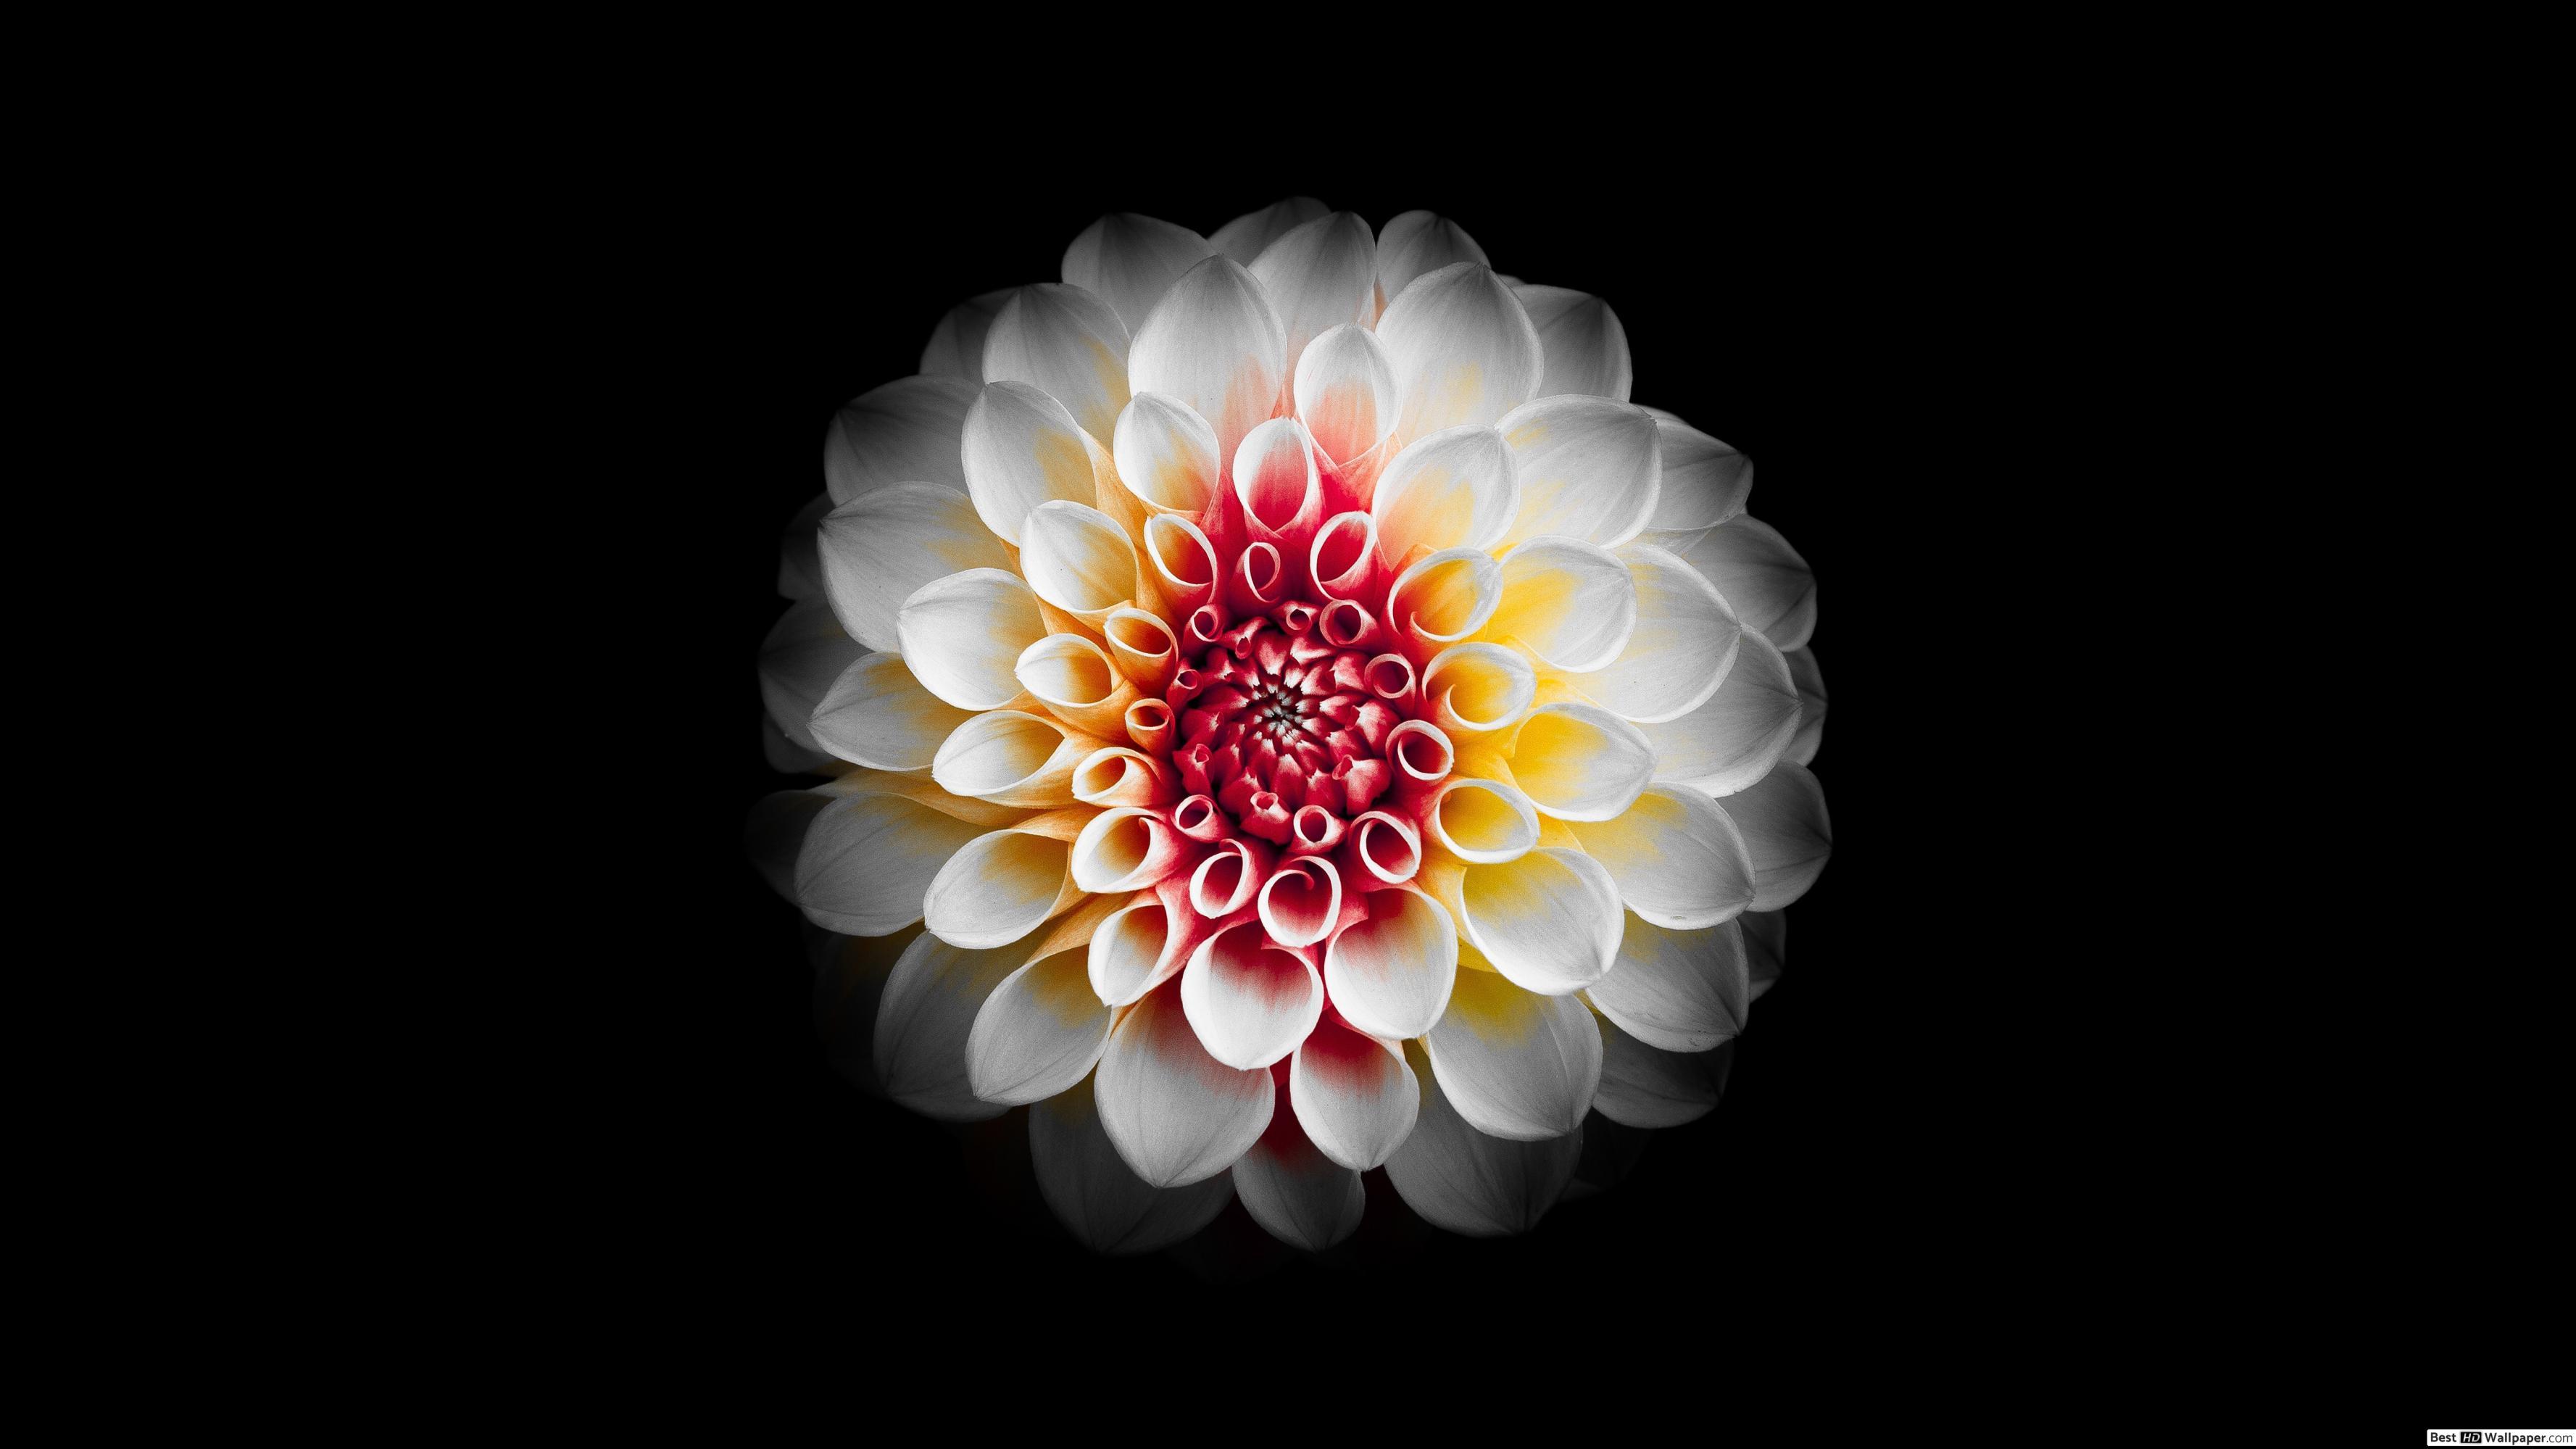 Flower Black Background HD